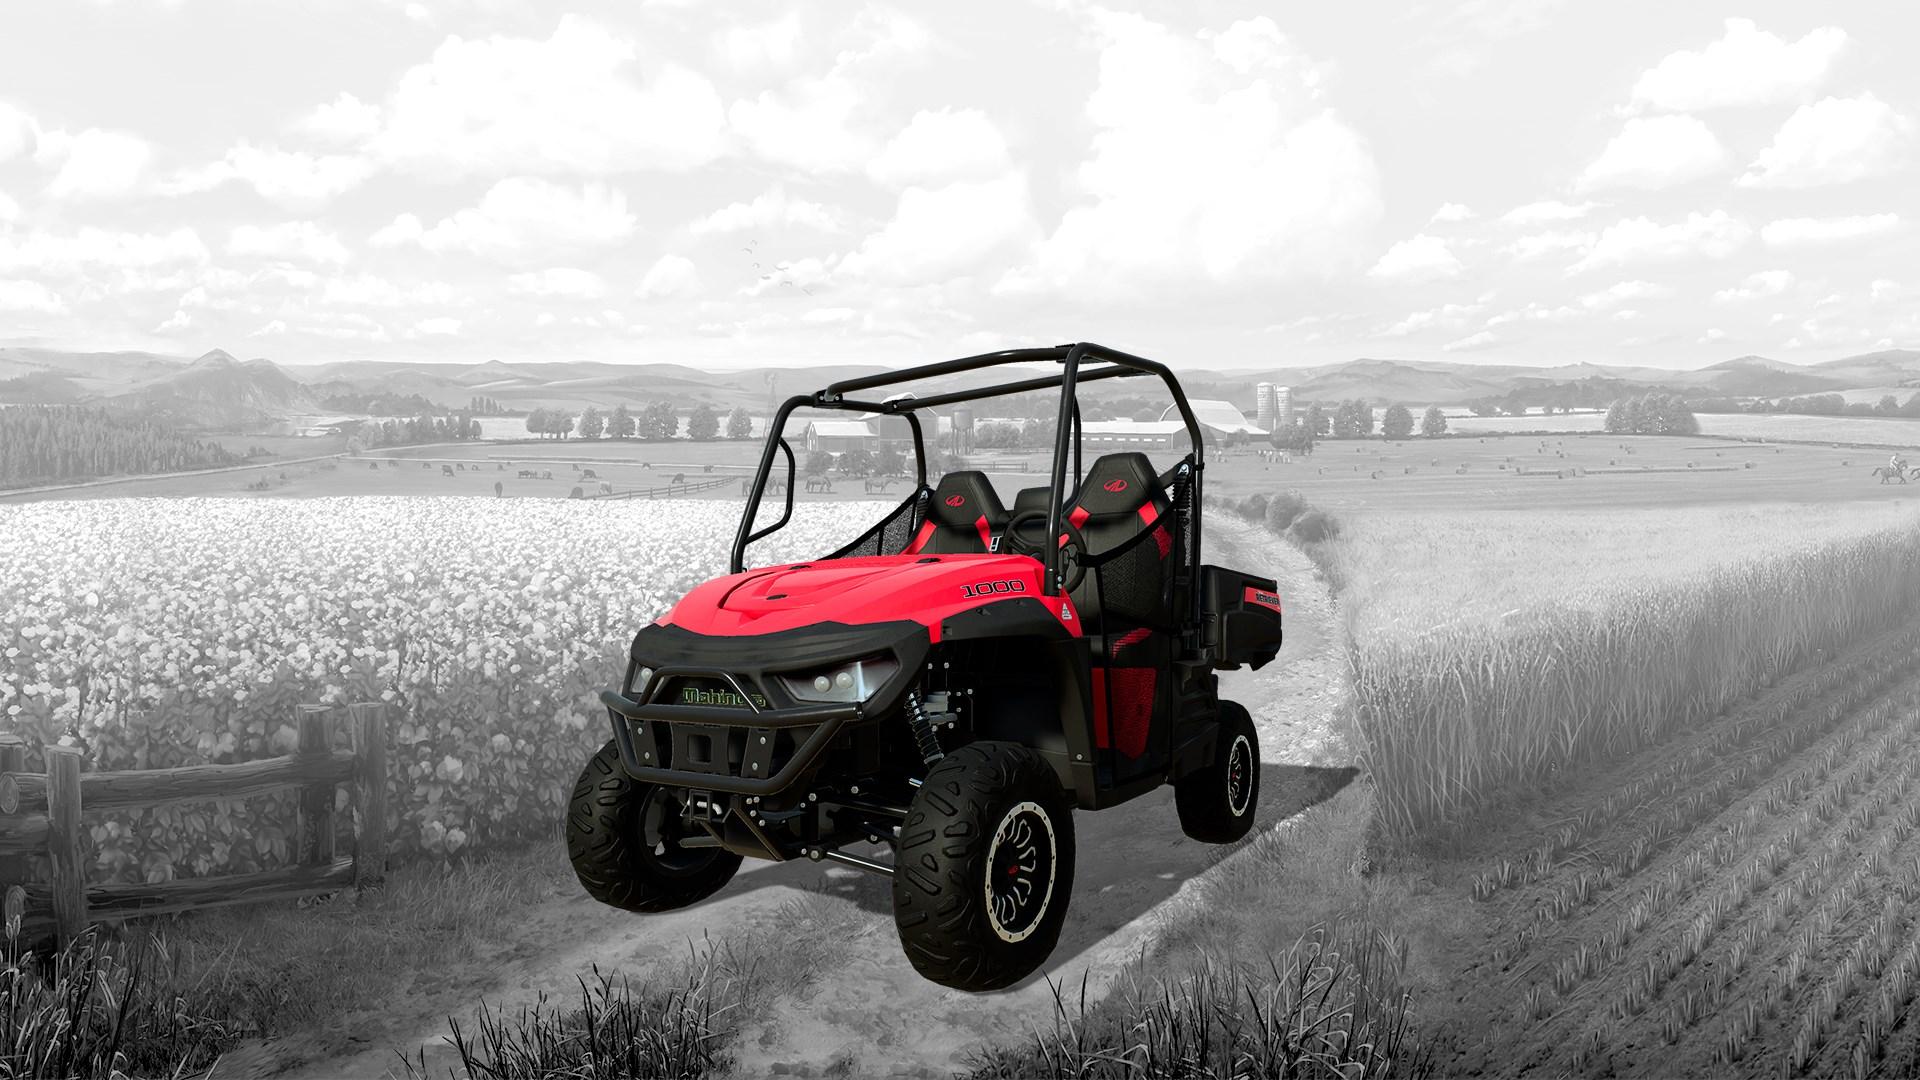 Buy Farming Simulator 19 - Mahindra Retriever DLC - Microsoft Store